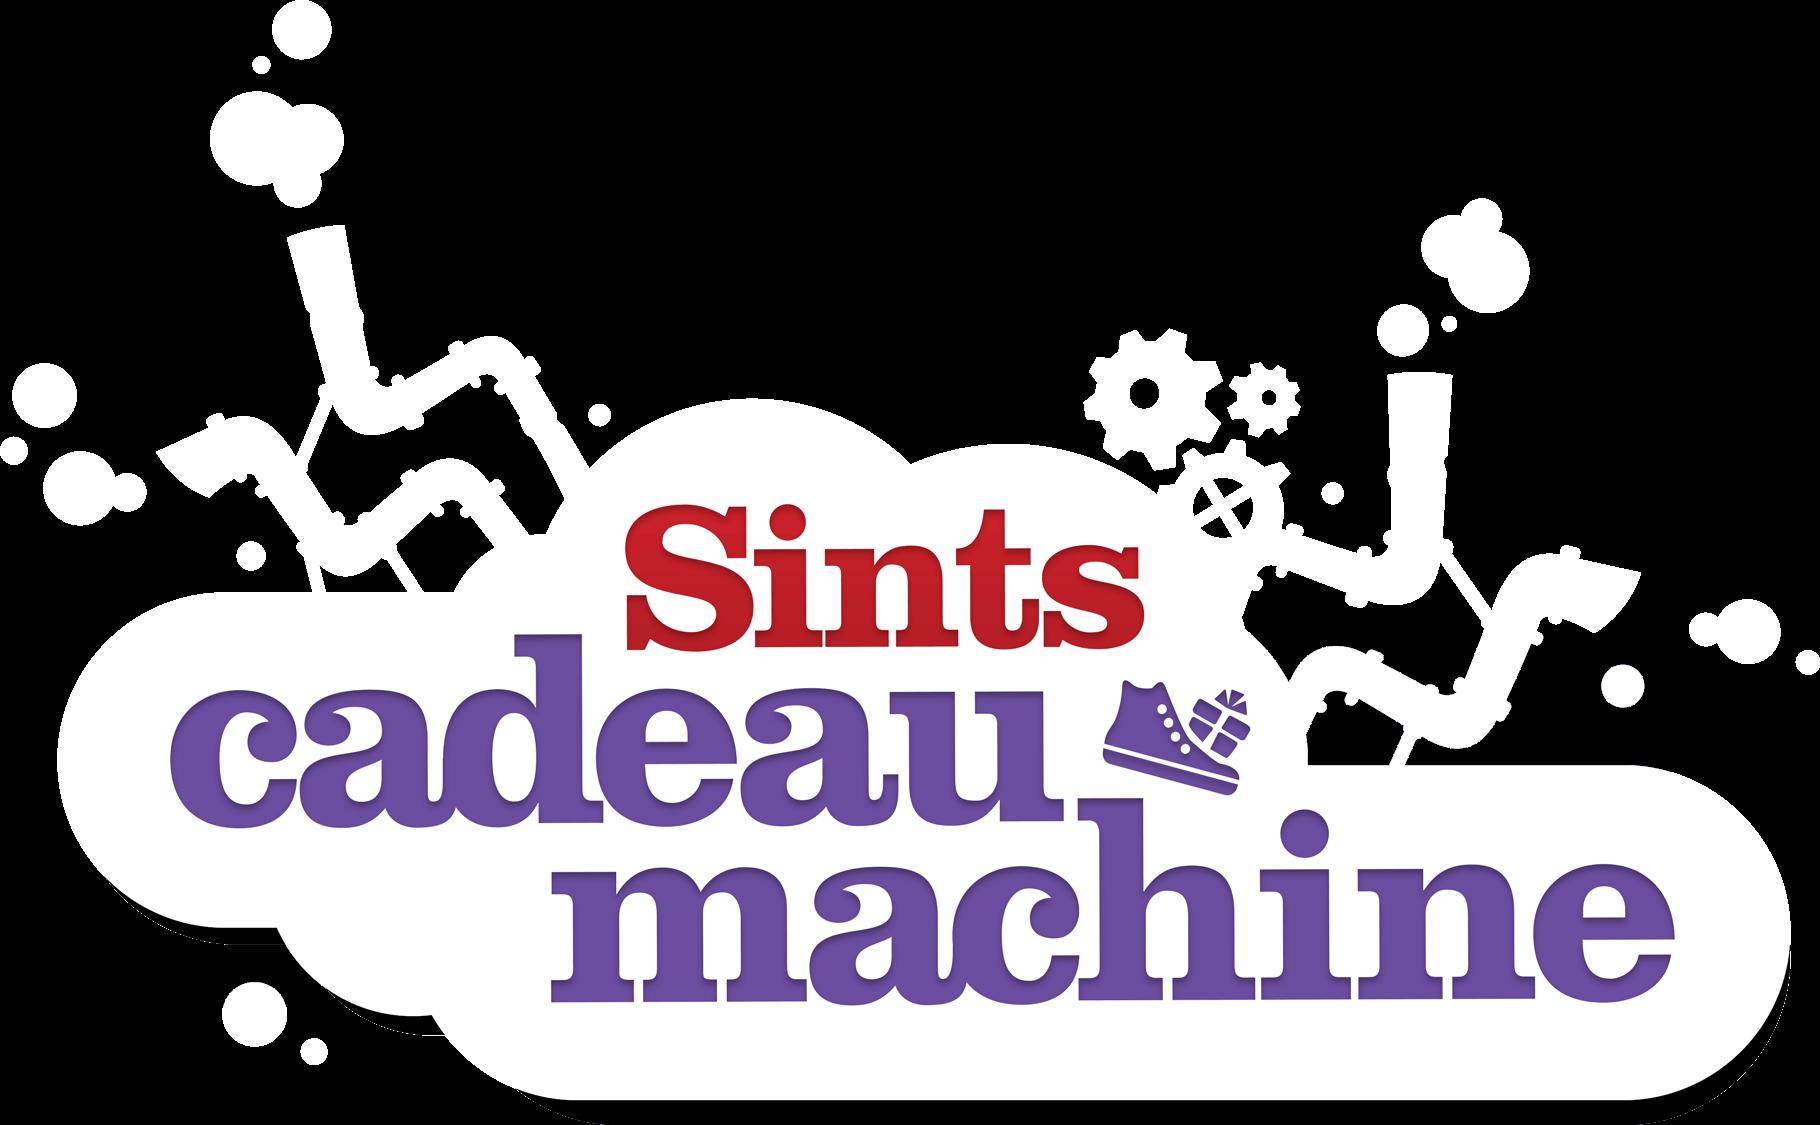 01 Bol com Cadeaumachine Logo - Brief van Sint aan ouders: gebruik mijn Sints cadeaumachine